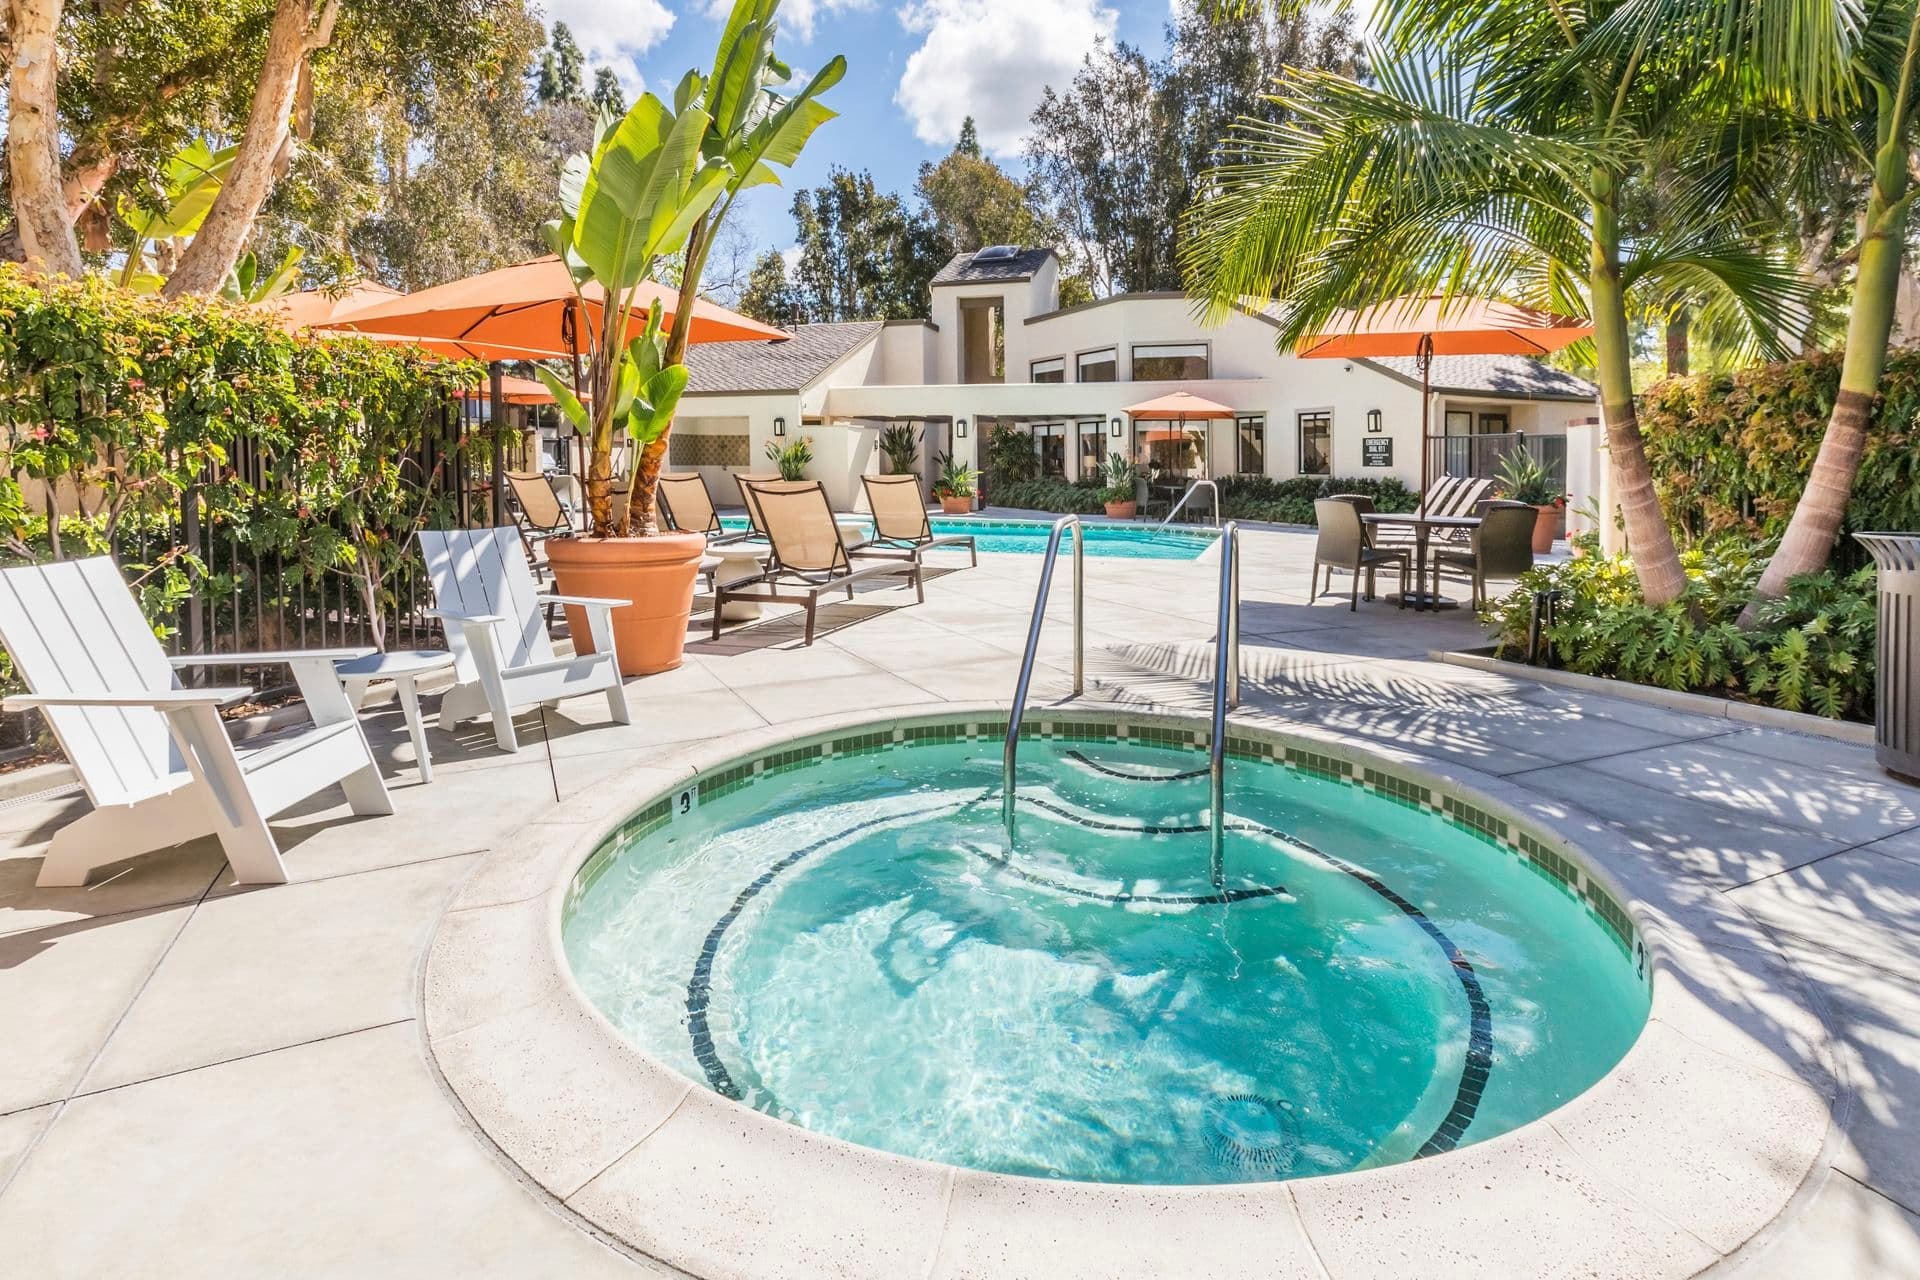 Pool view at Cedar Creek Apartment Homes in Irvine, CA.